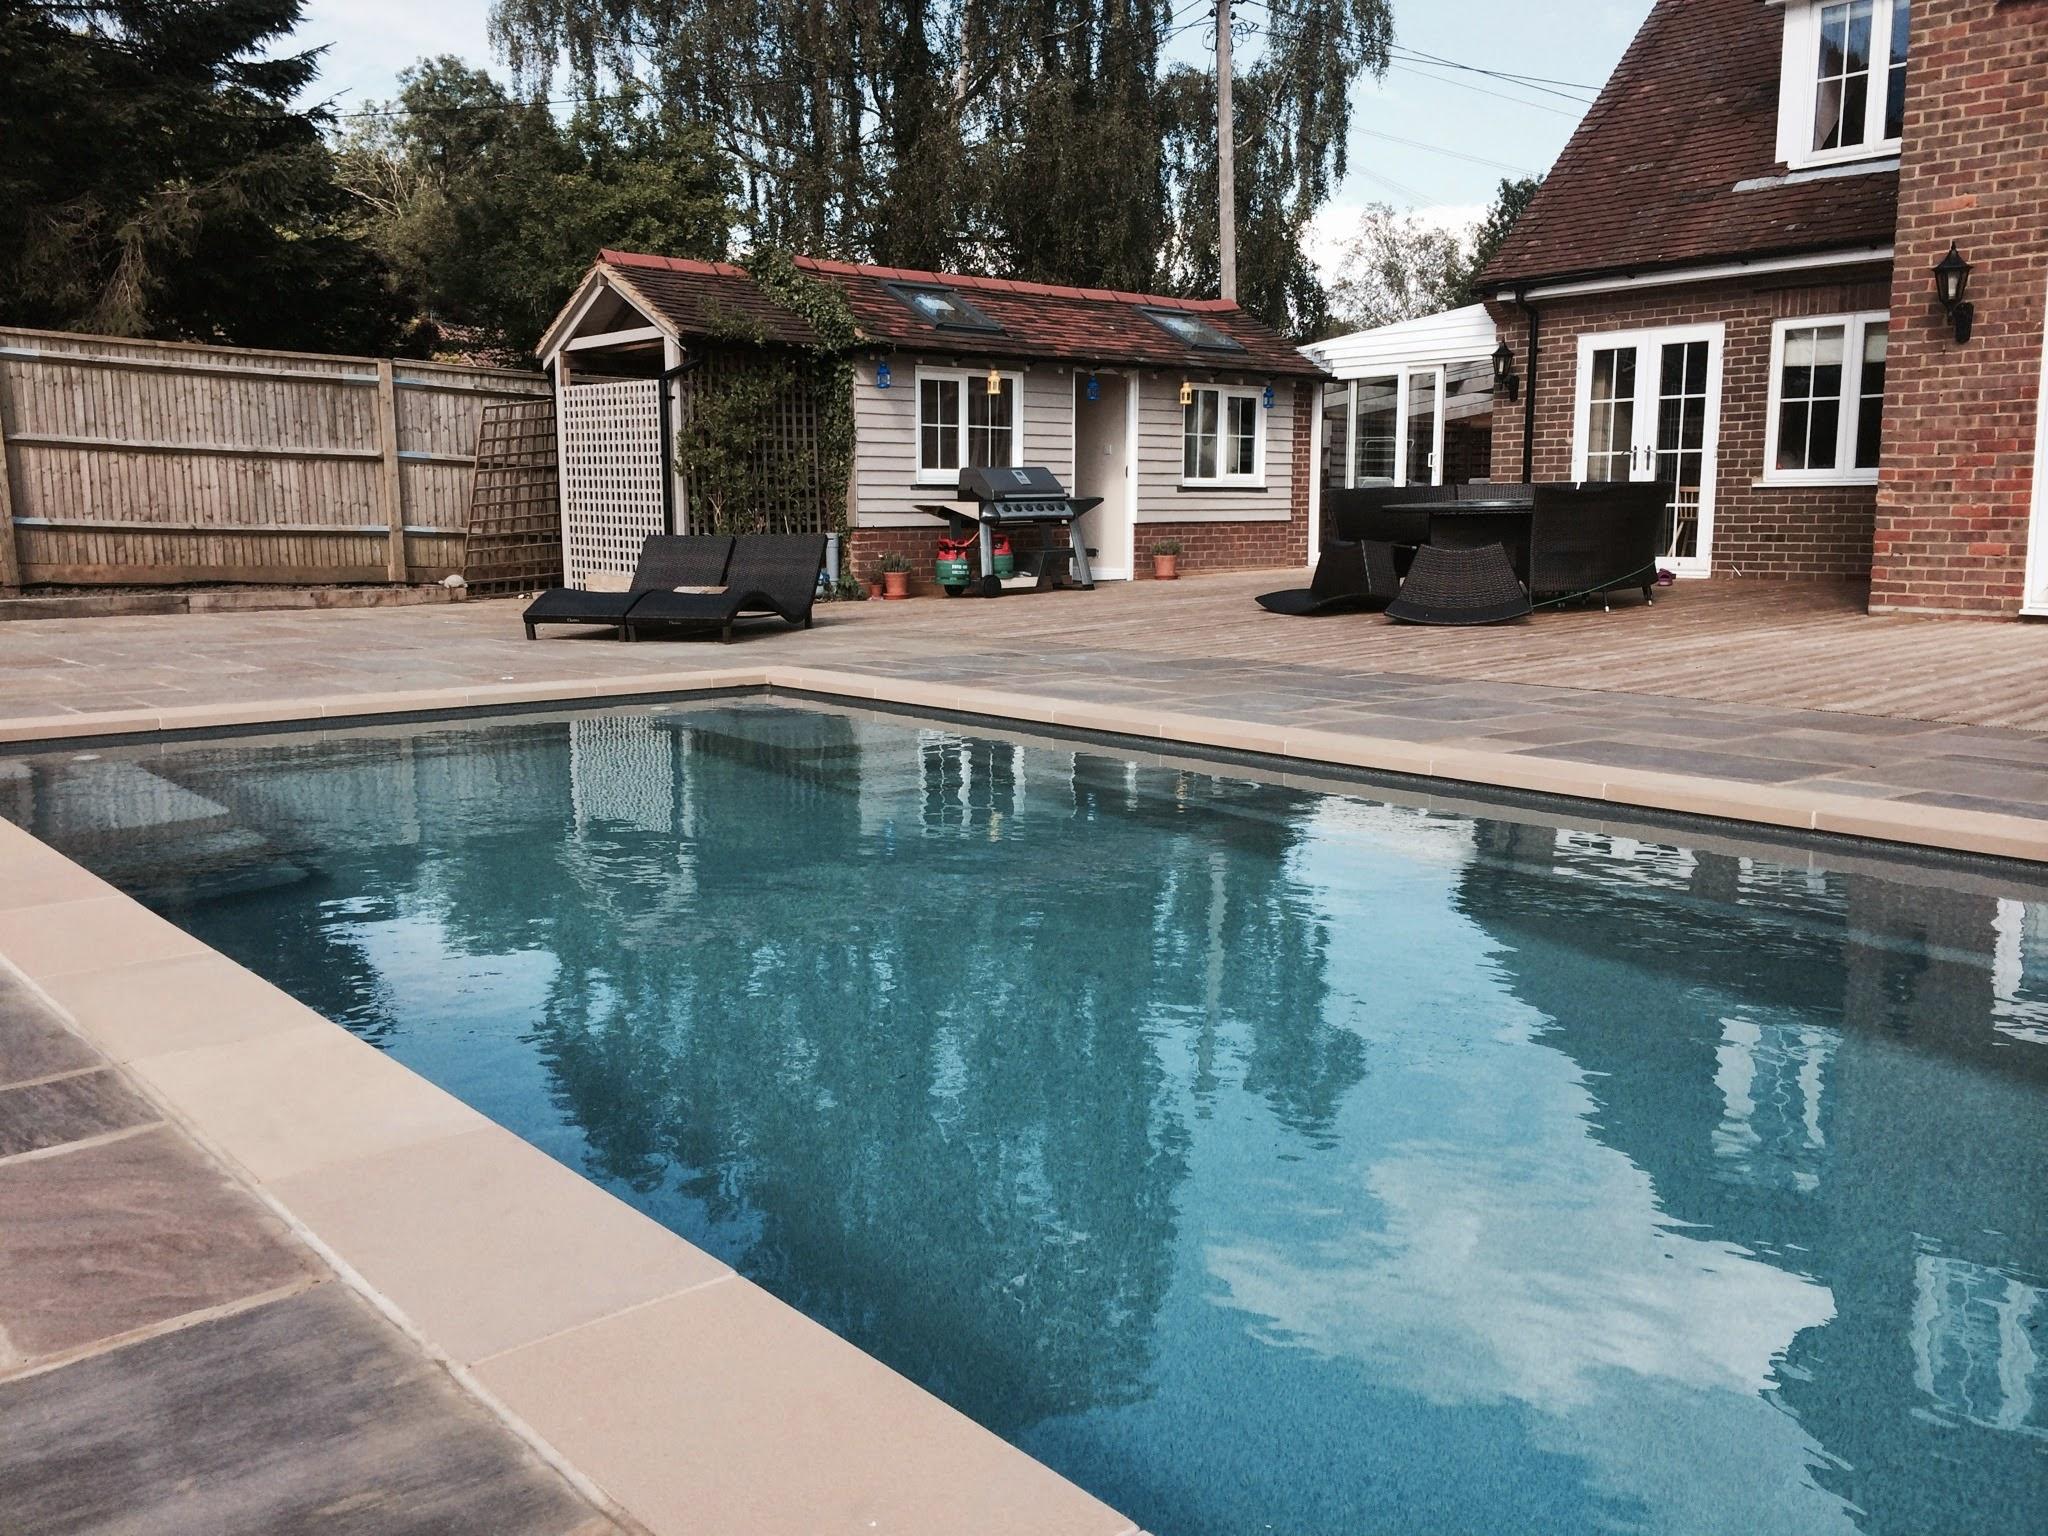 Outdoor swimming pool installation design consruction for Outdoor swimming pool design uk